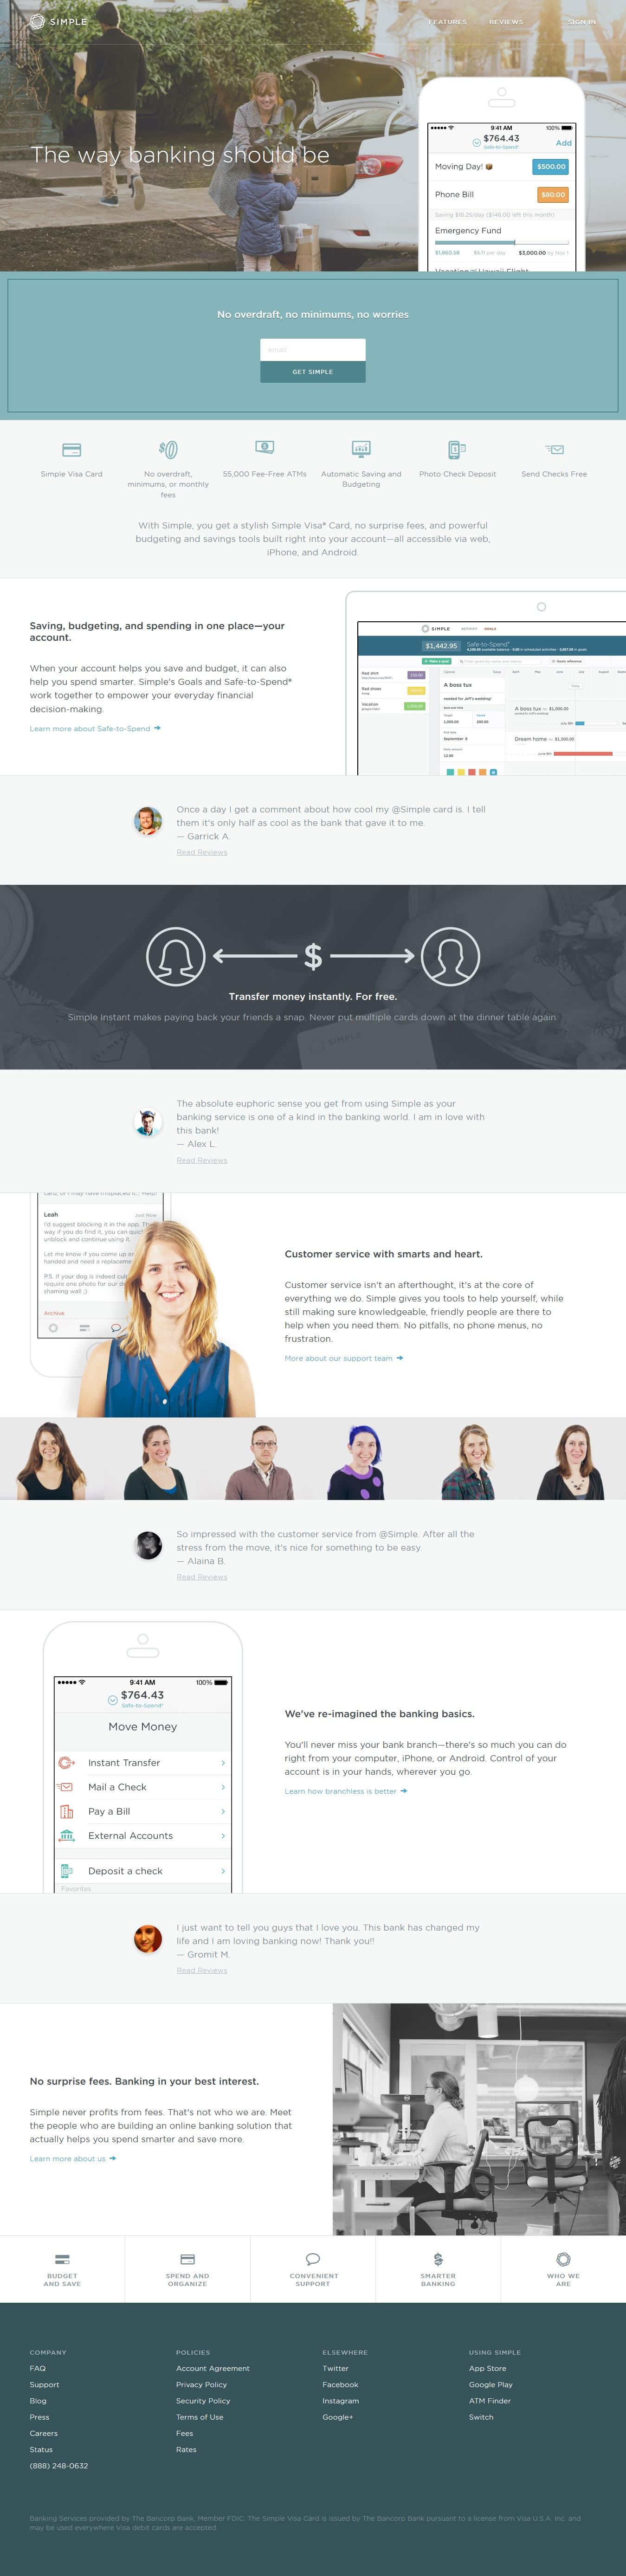 Simple Landing Page Simple But Lacks Clarity Landing Page